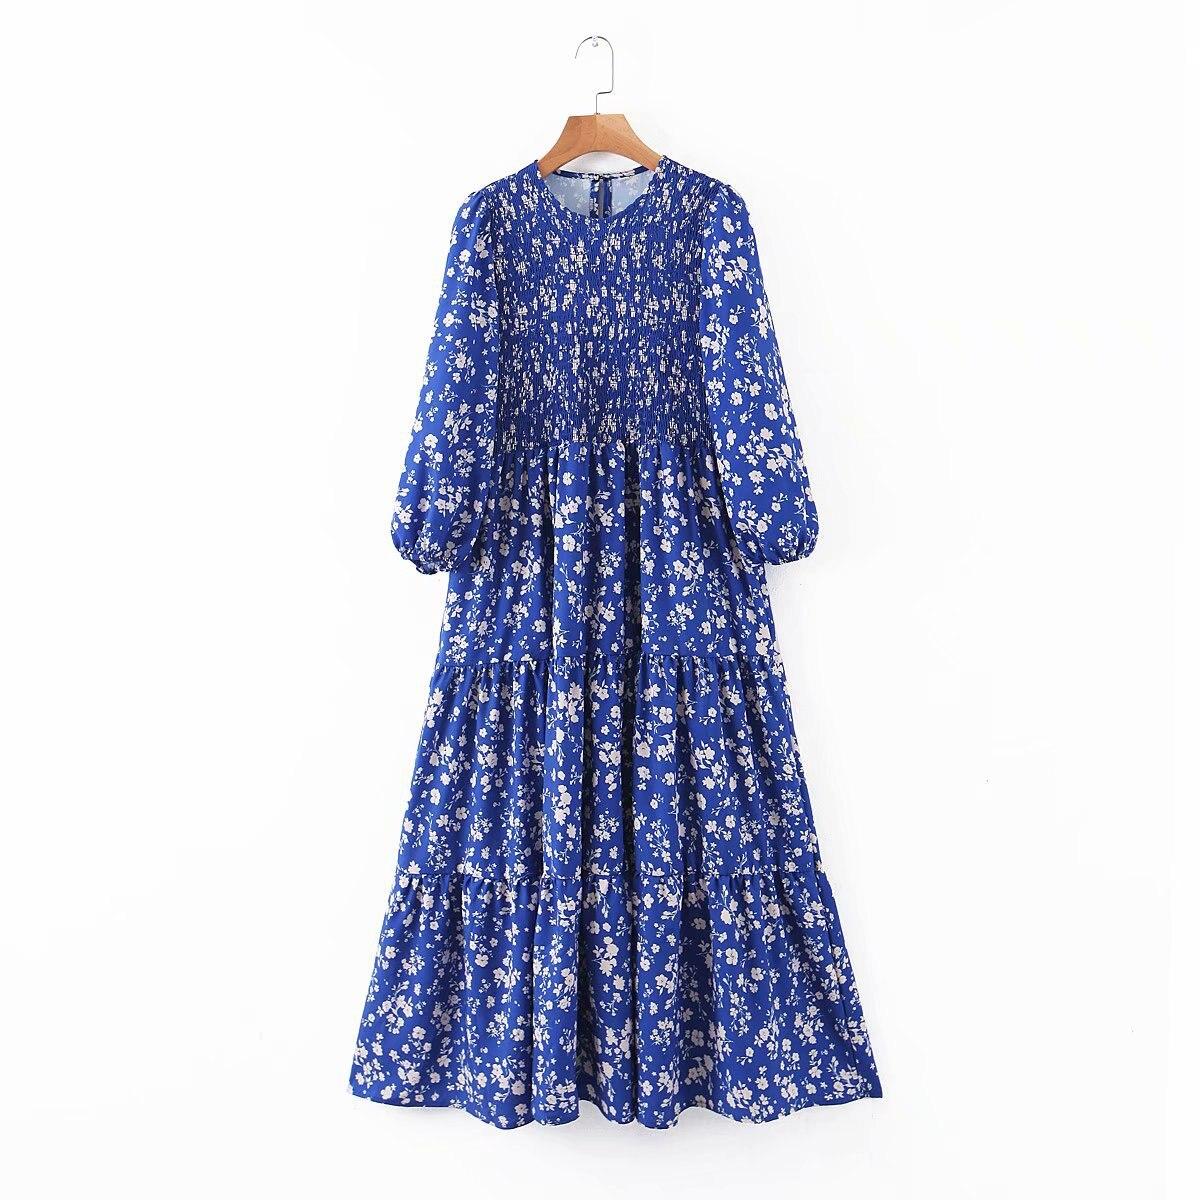 2020 New Spring Summer European Blue Floral Printed Zaraing Women Dress Vadiming Sheining Female Streetwear Dress XDL2613